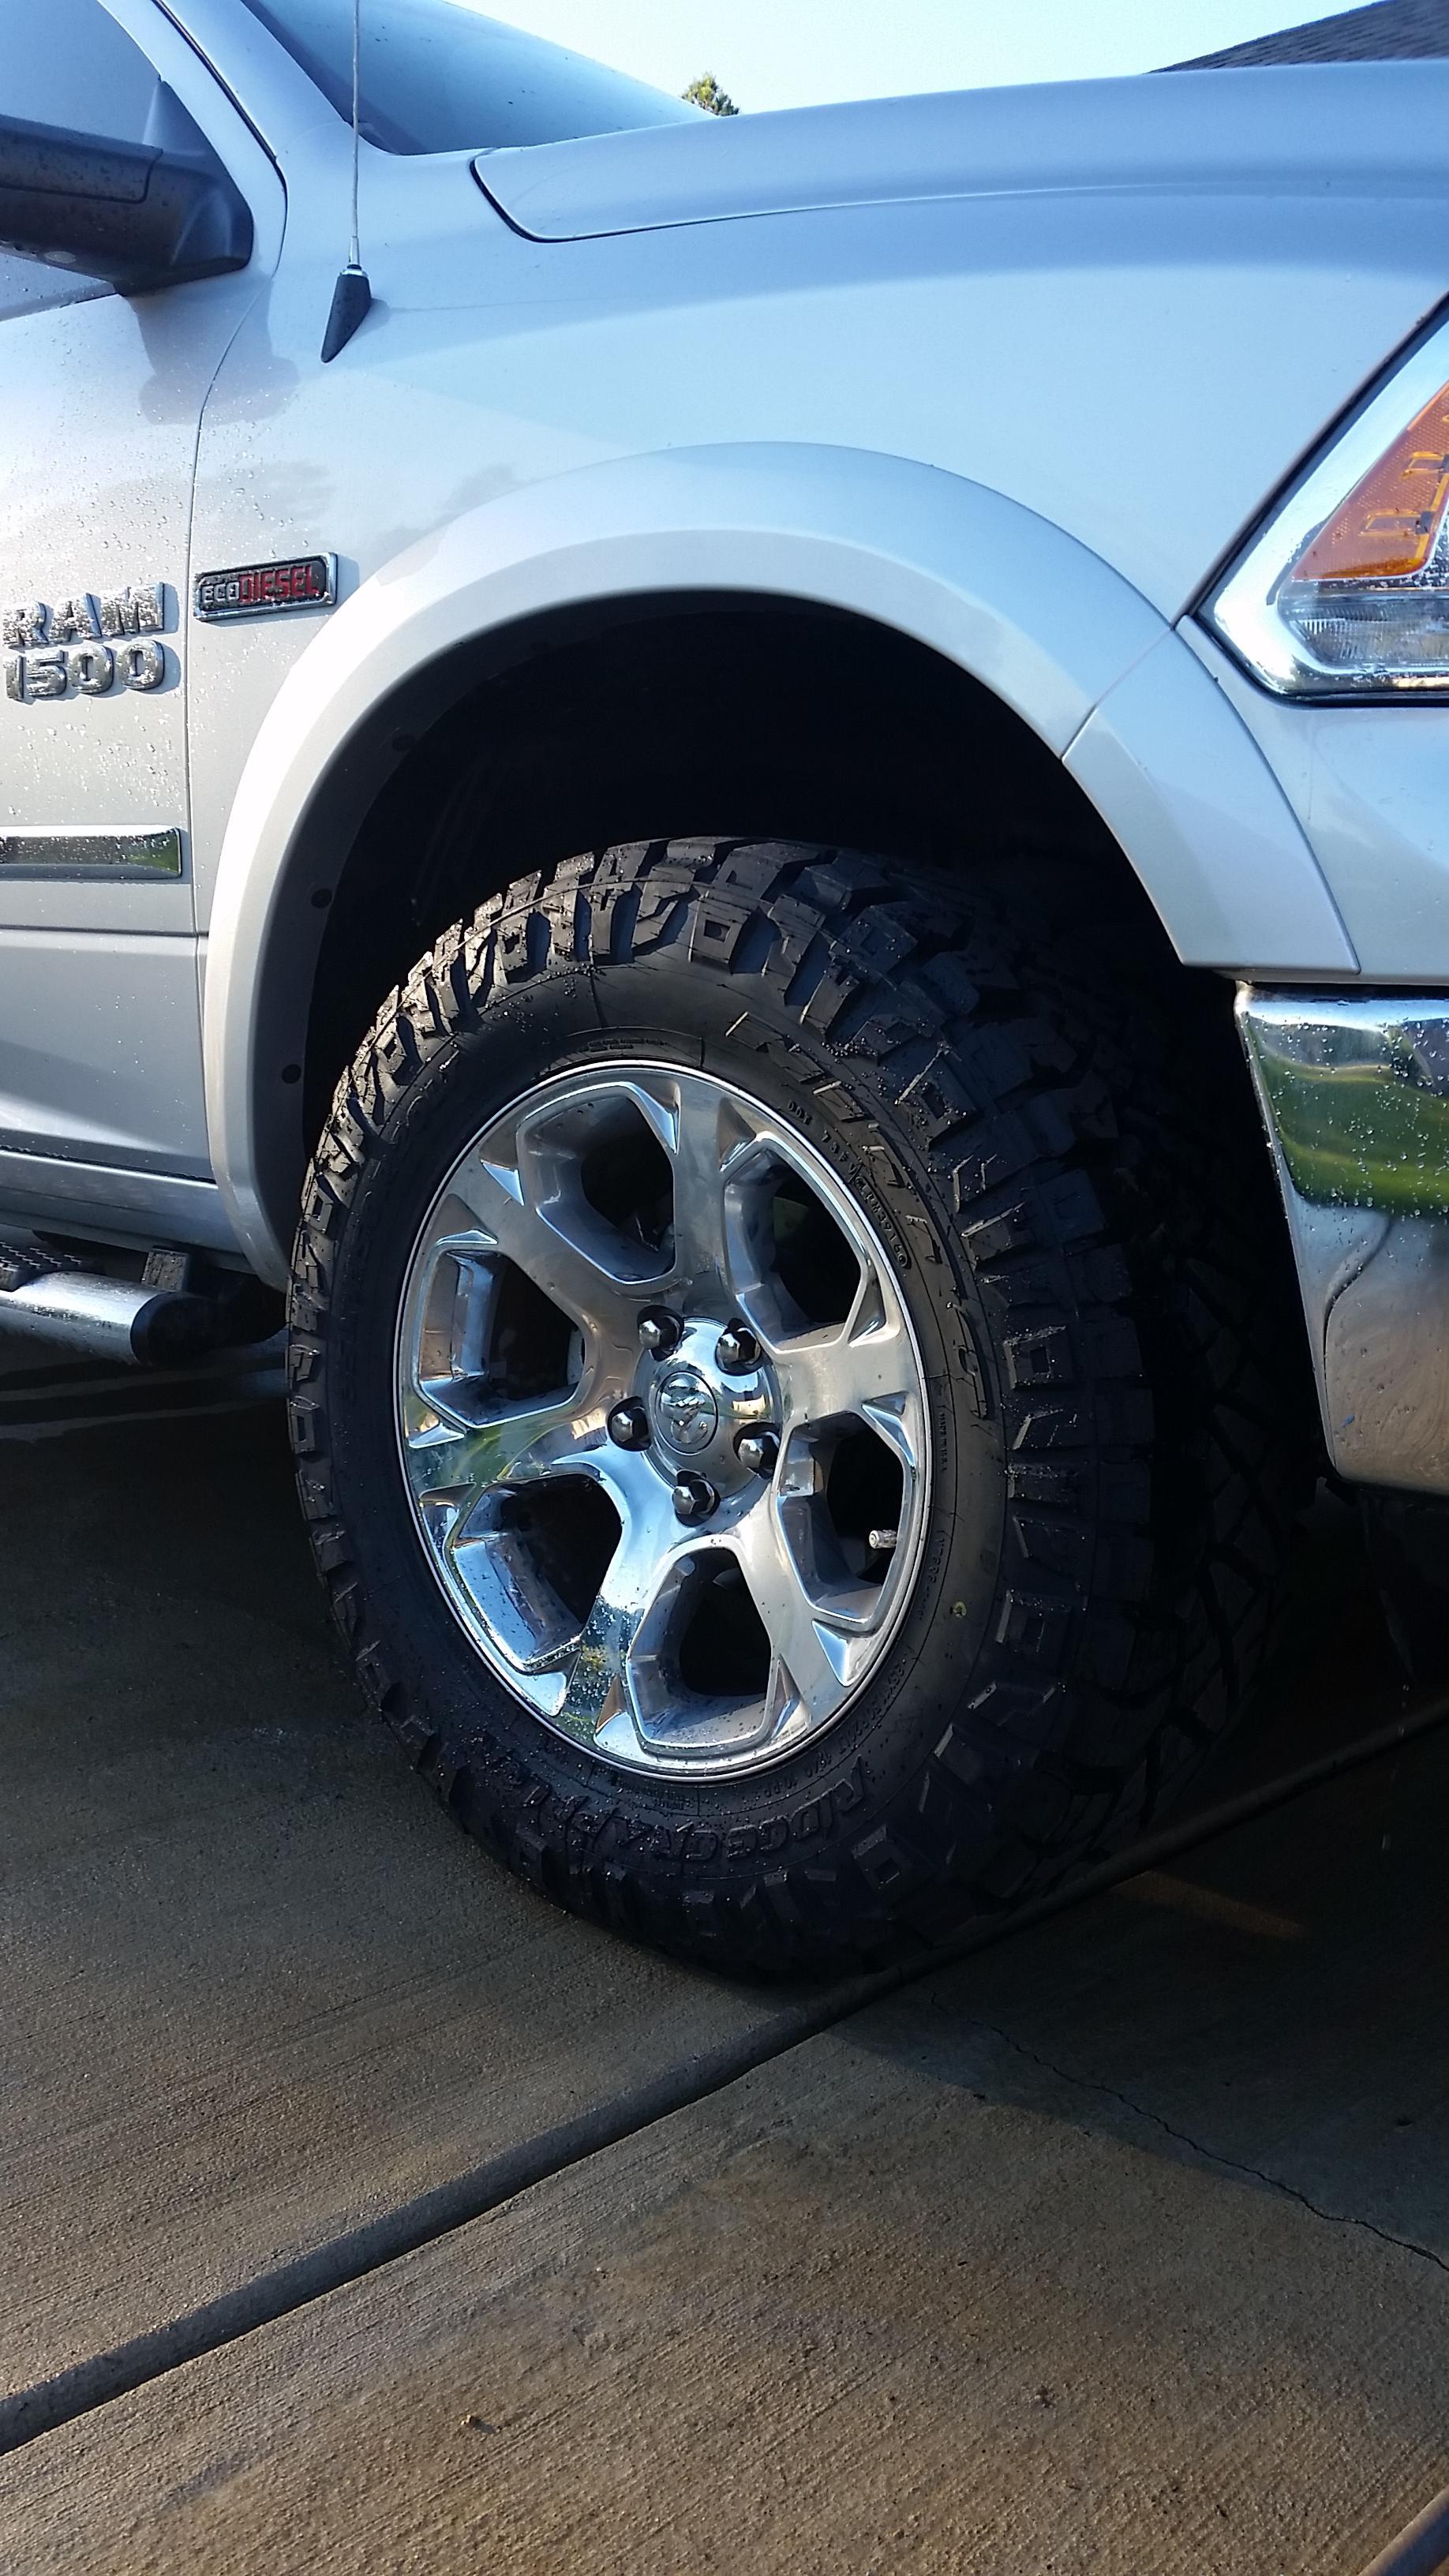 Ram 1500 Bed Cover >> Dodge Cummins Diesel Forum - View Single Post - Nitto ...